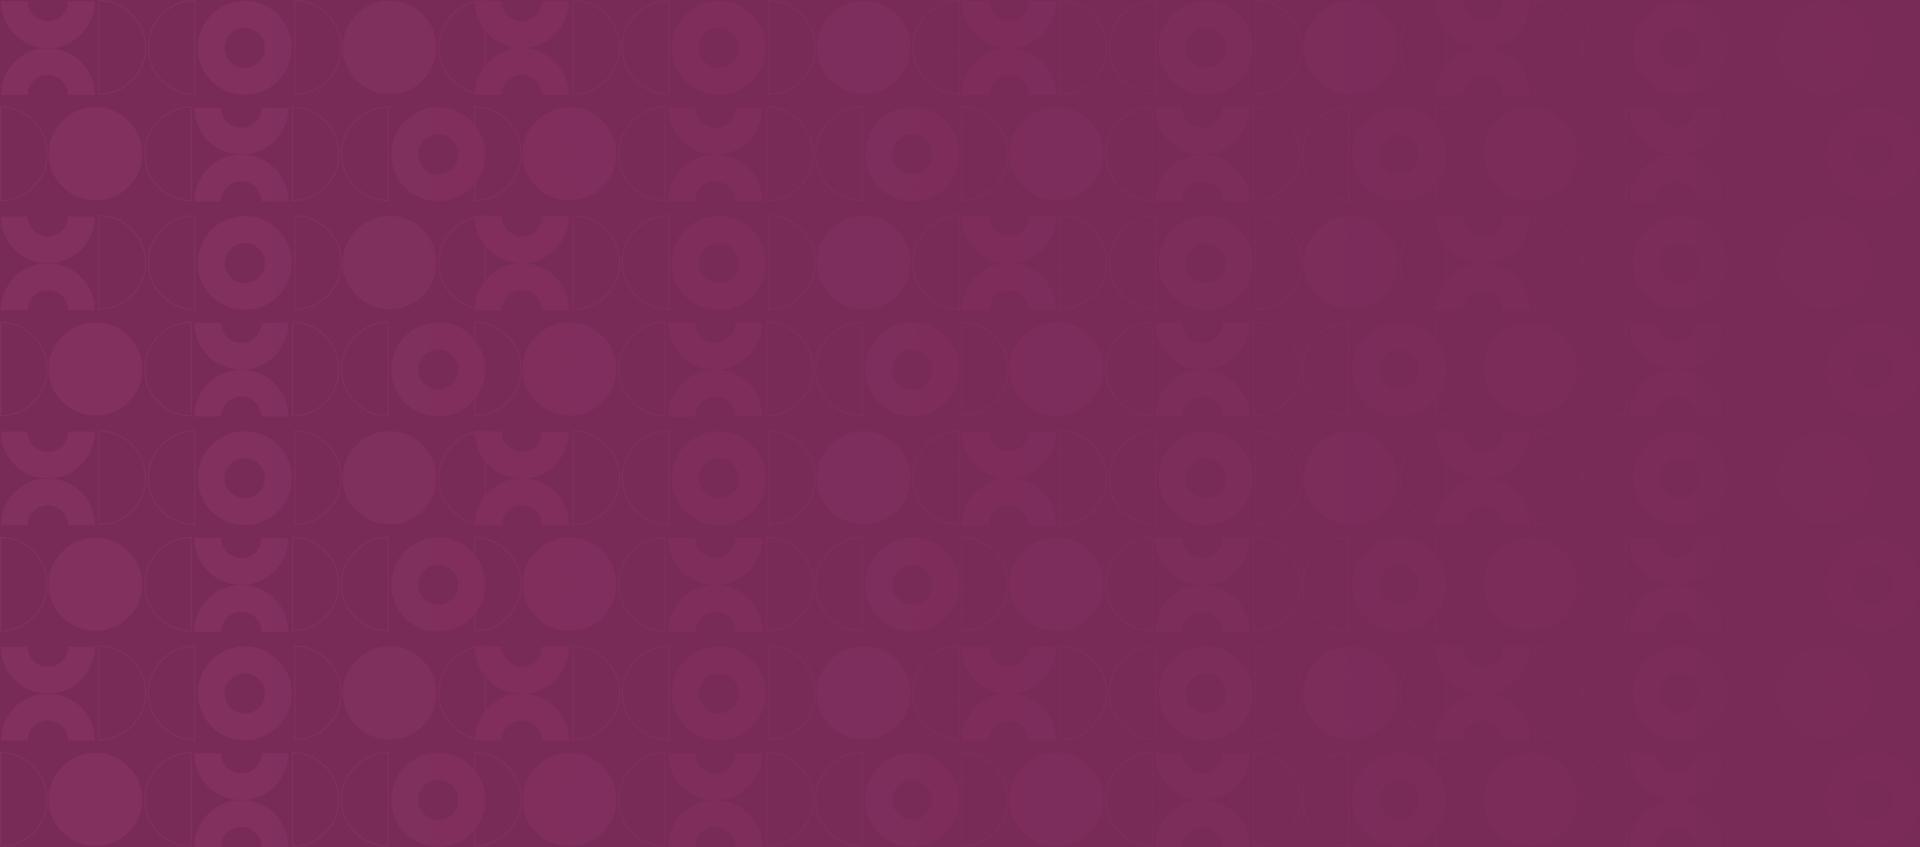 Background roxo segundo banner